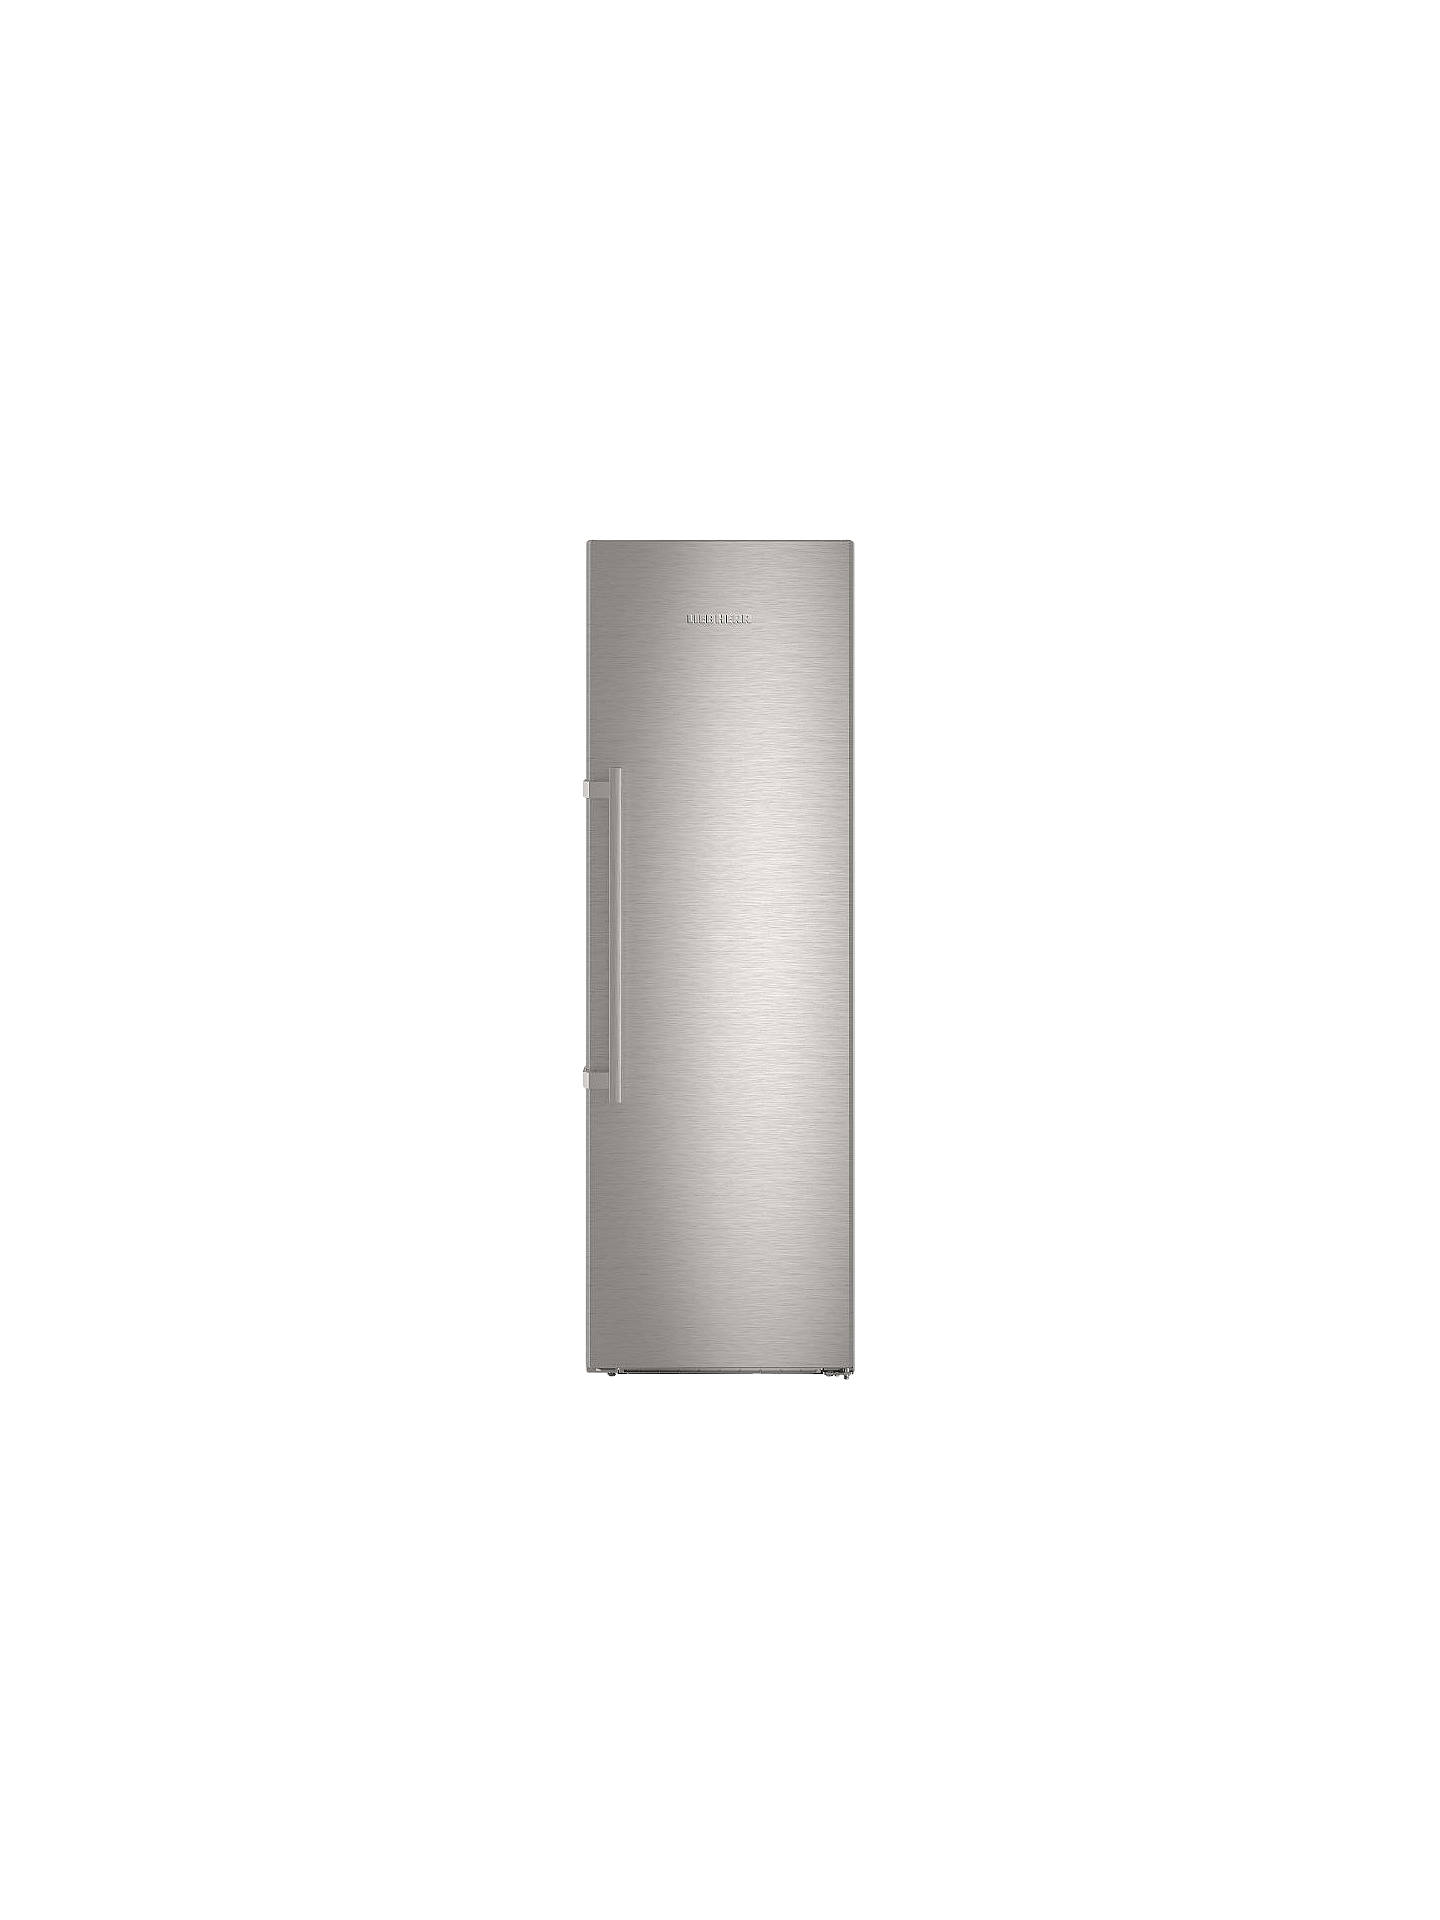 Liebherr Kef4310 Freestanding Fridge A Energy Rating 60cm Wide Stainless Steel At John Lewis Partners